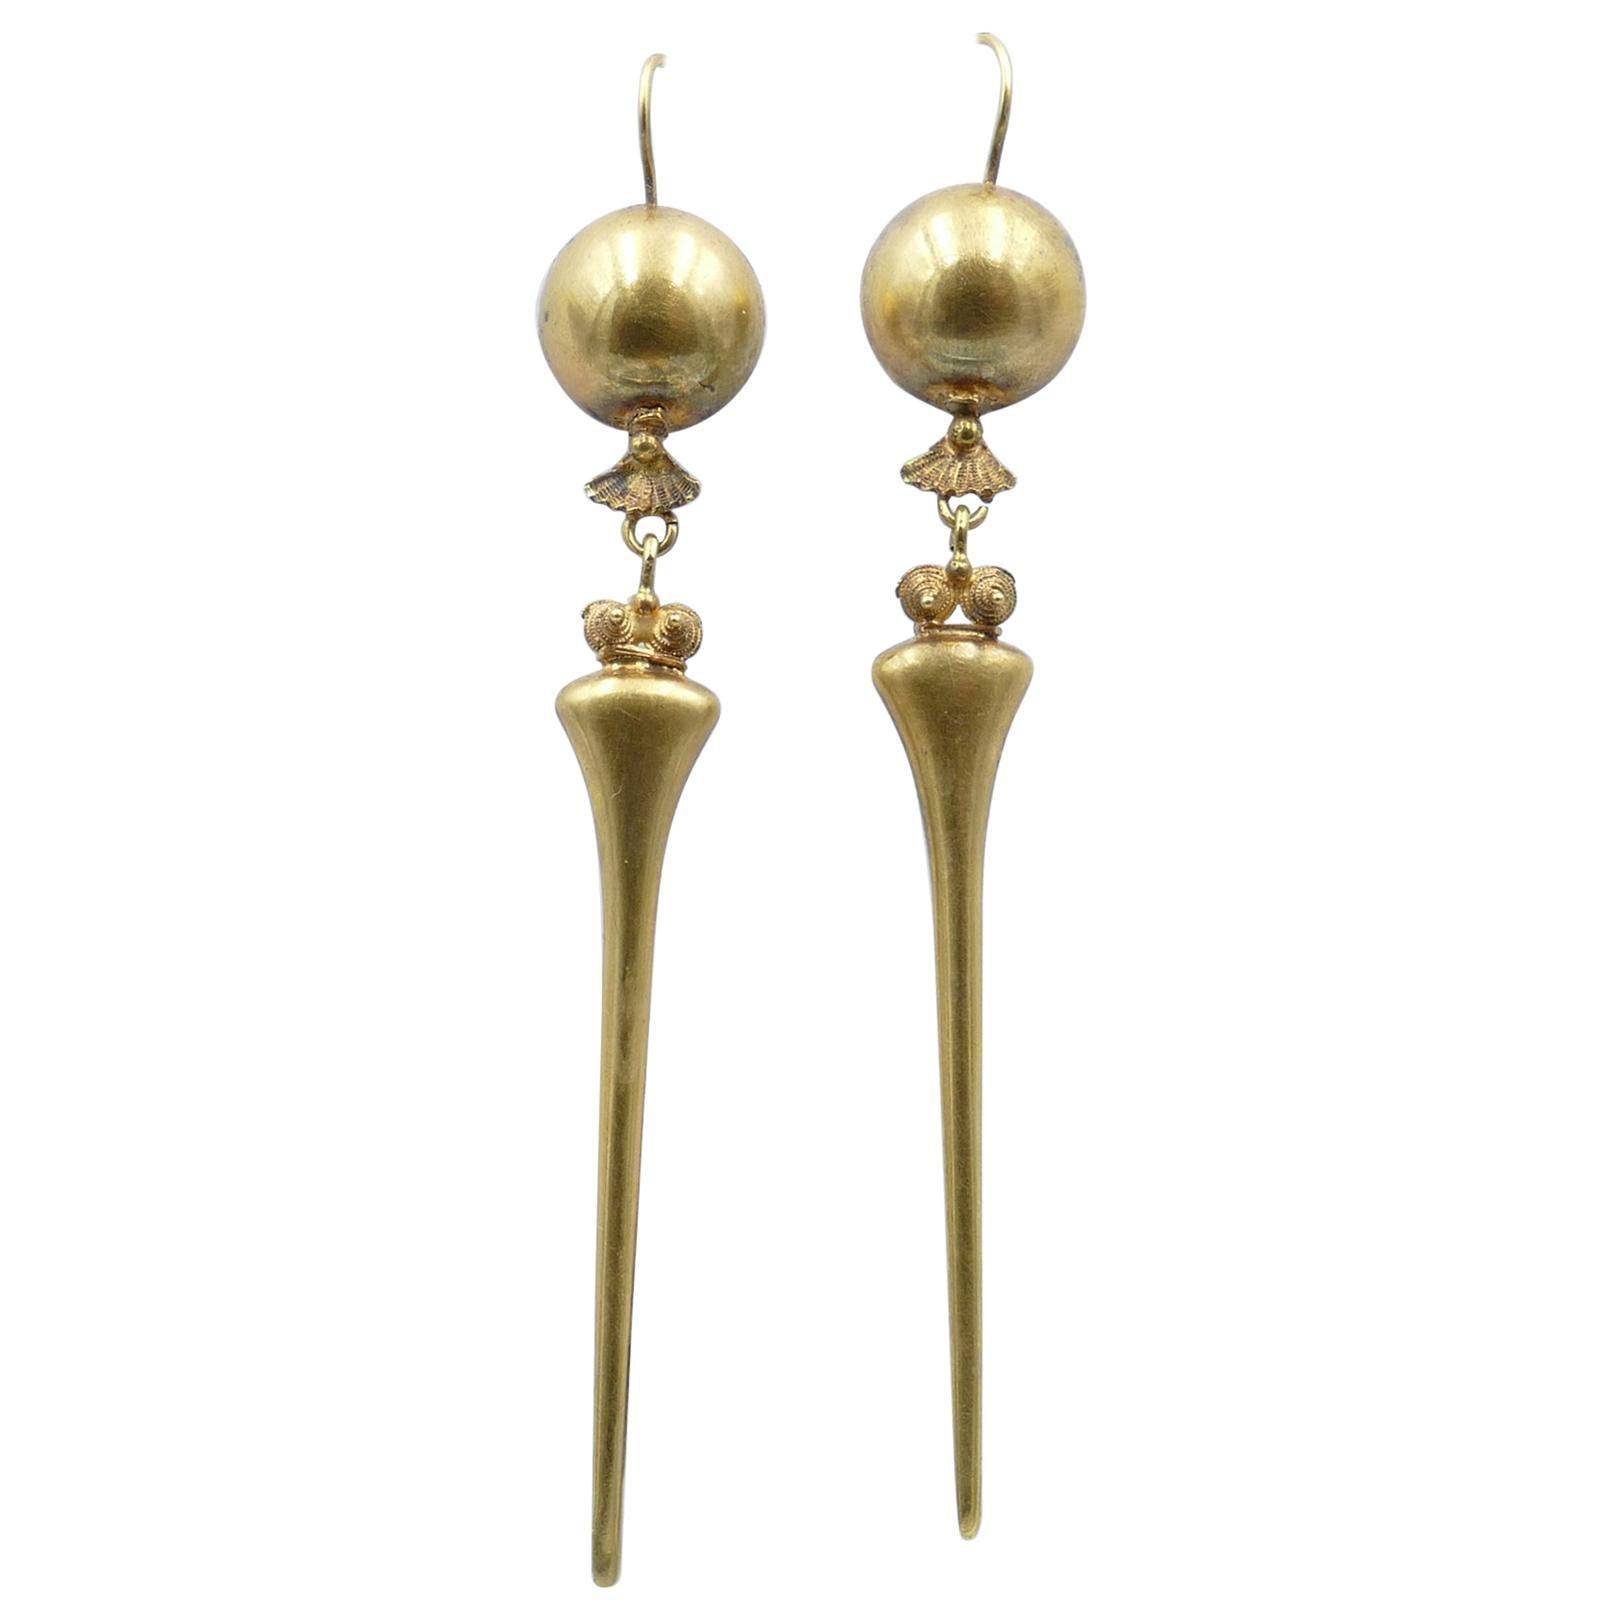 Antique Handmade 9 Carat Yellow Gold Drop Earrings